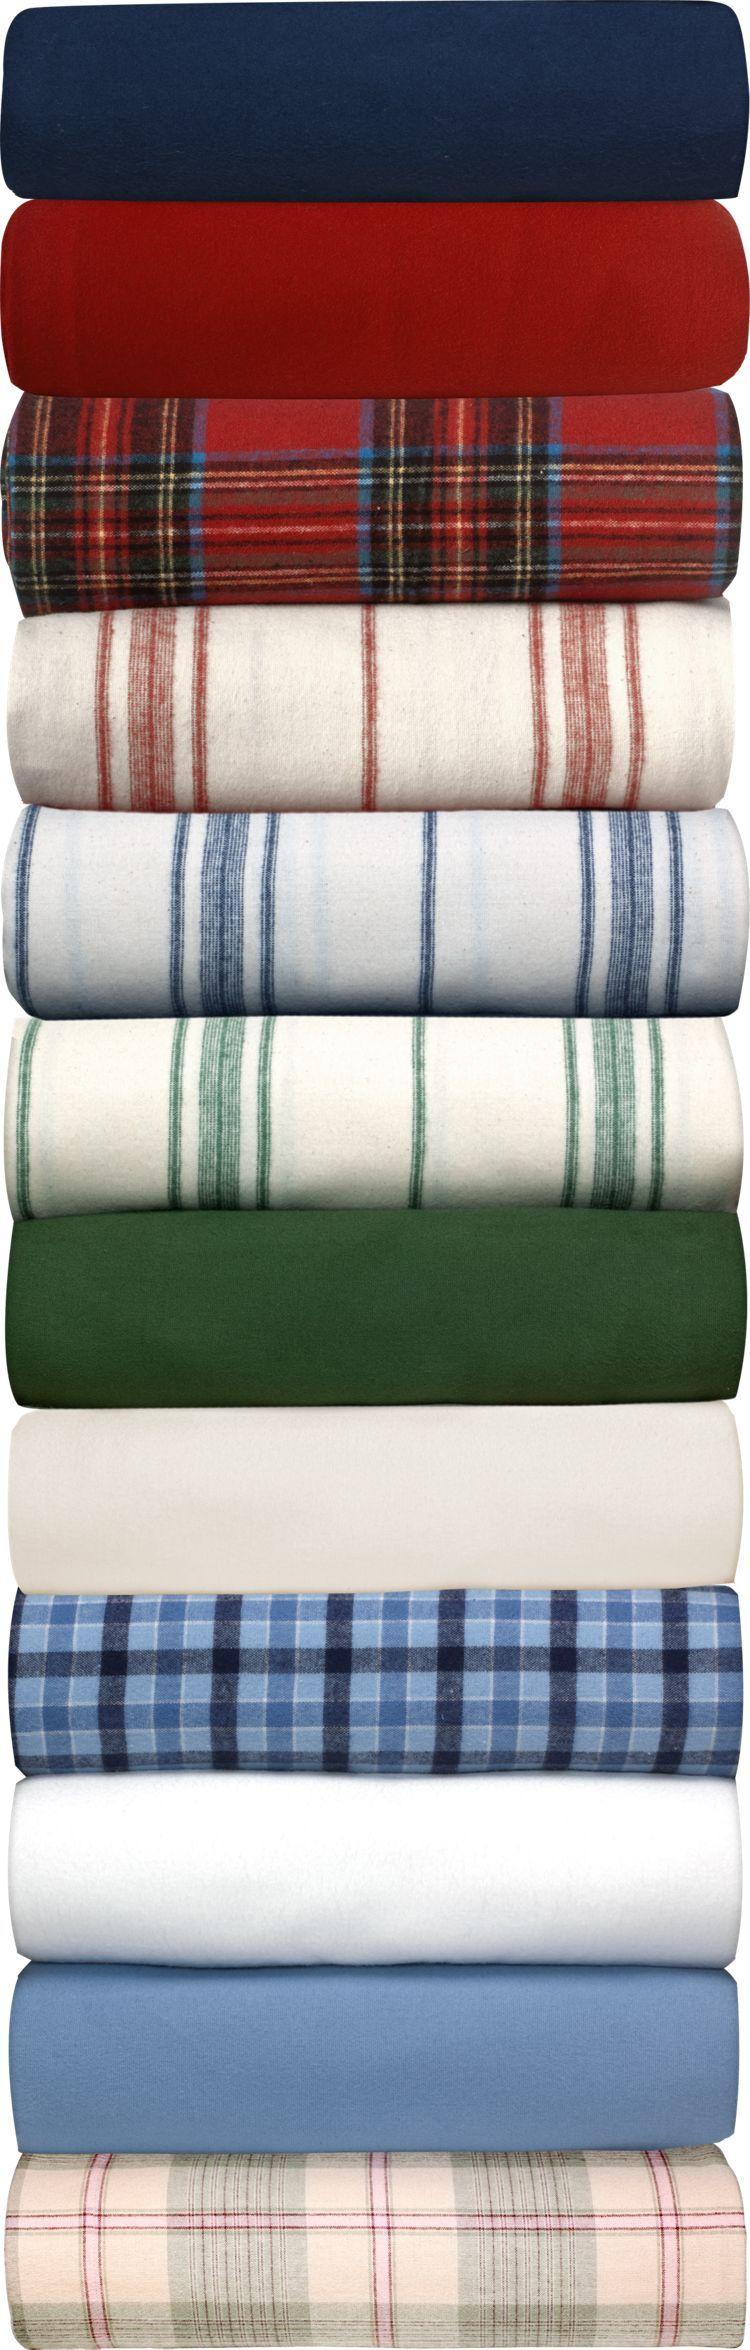 Portuguese Cotton Flannel Sheet Blanket Plaid Sheets Linen Duvet Covers Fashion Room